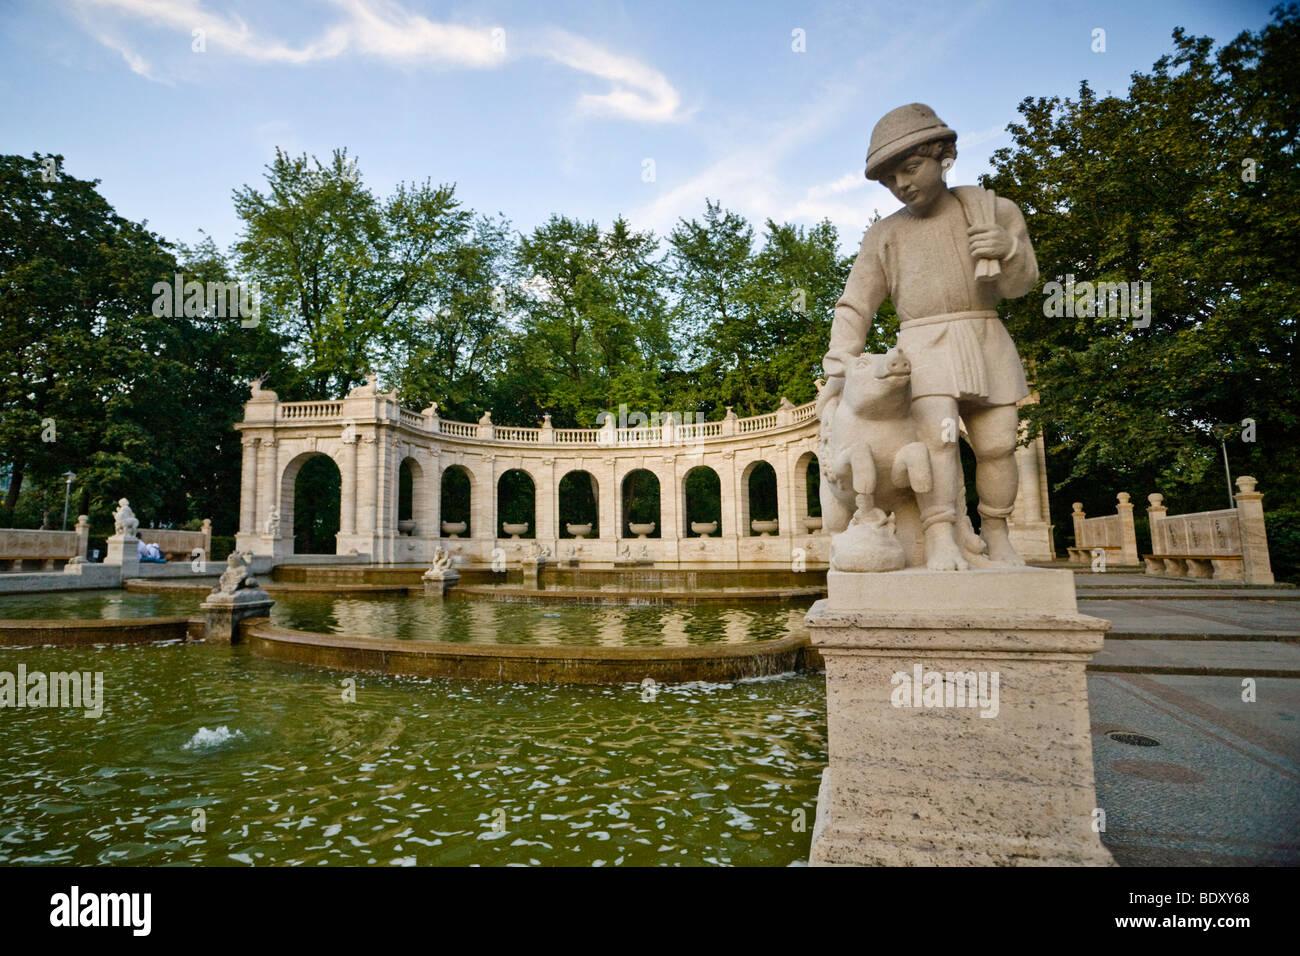 Hans im Glueck, Lucky Hans, fairytale fountain Volkspark am Friedrichshain, Friedrichshain, Berlin, Germany, Europe - Stock Image